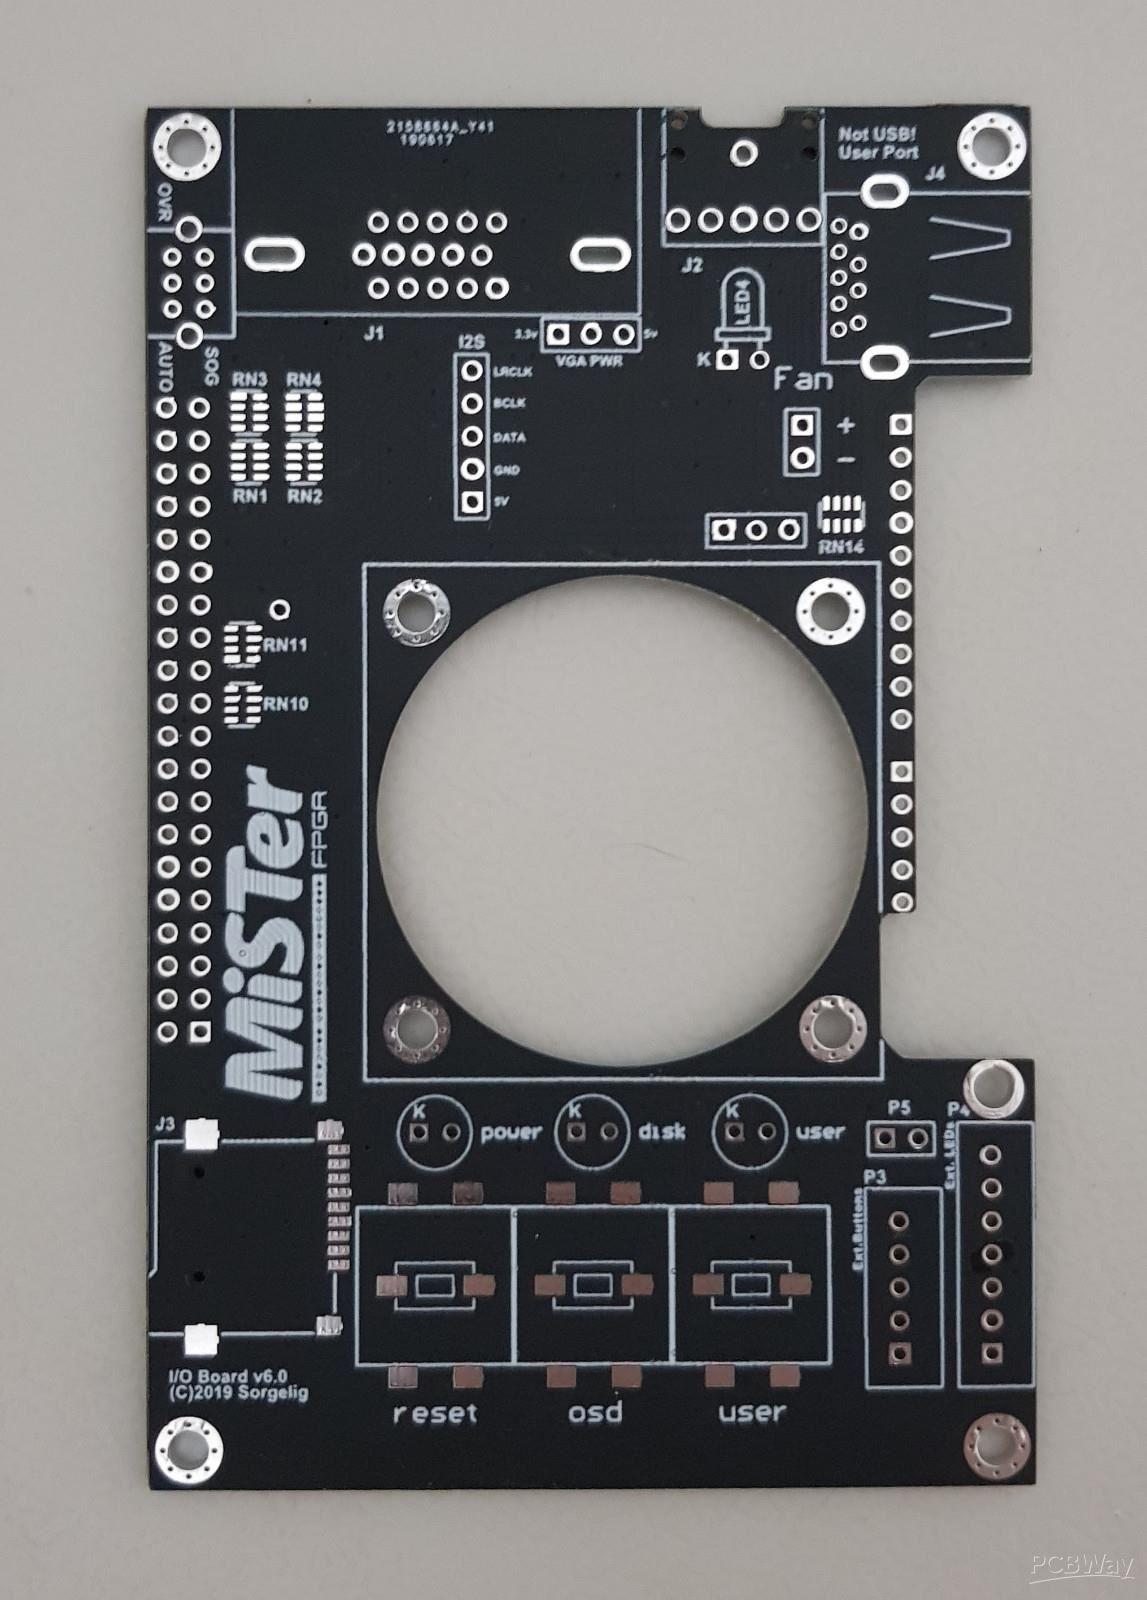 I/O Board v6 0 for MiSTer - Share Project - PCBWay